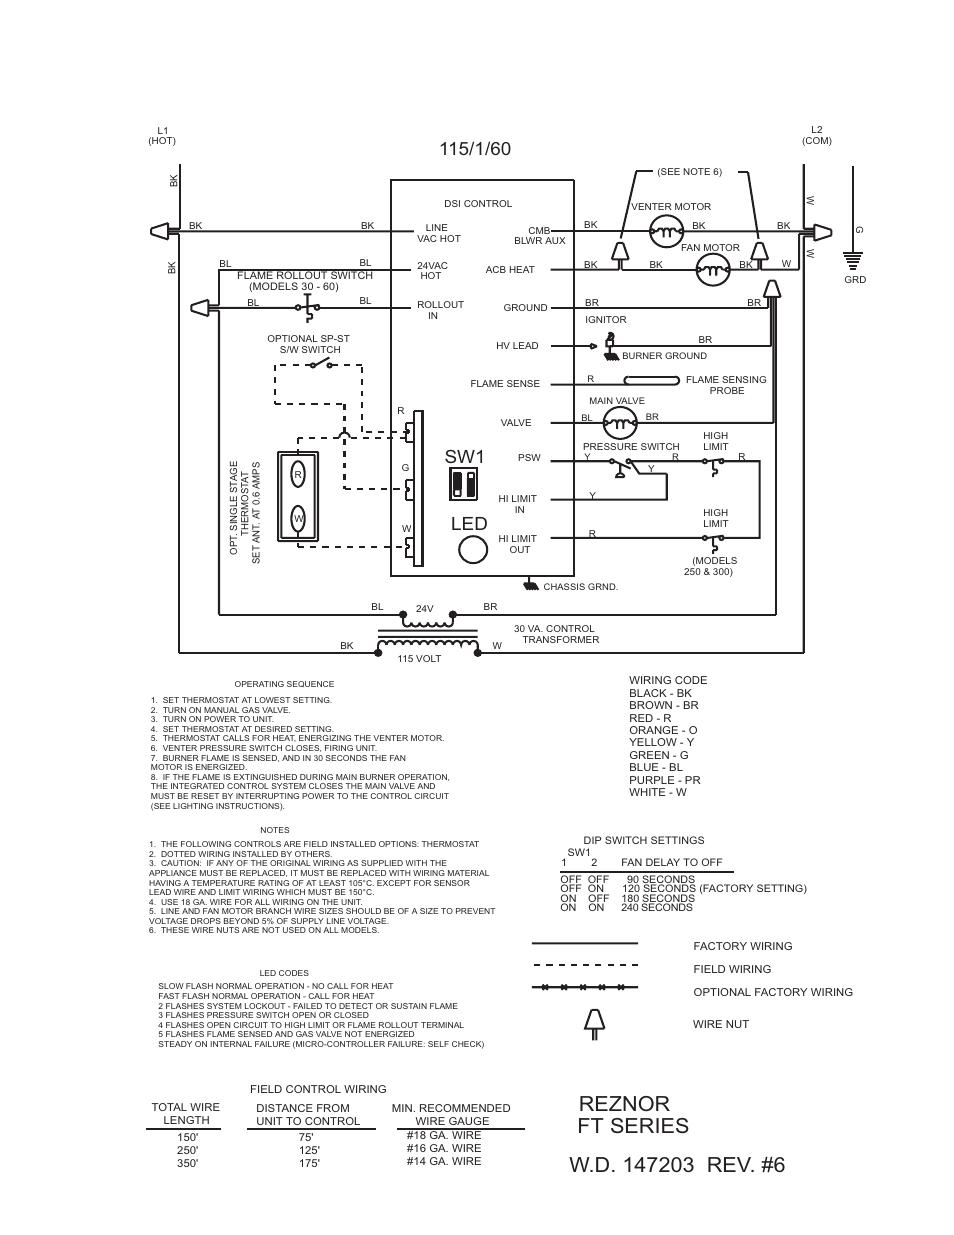 Allen Bradley Powerflex 400 Vfd Manual Pdf